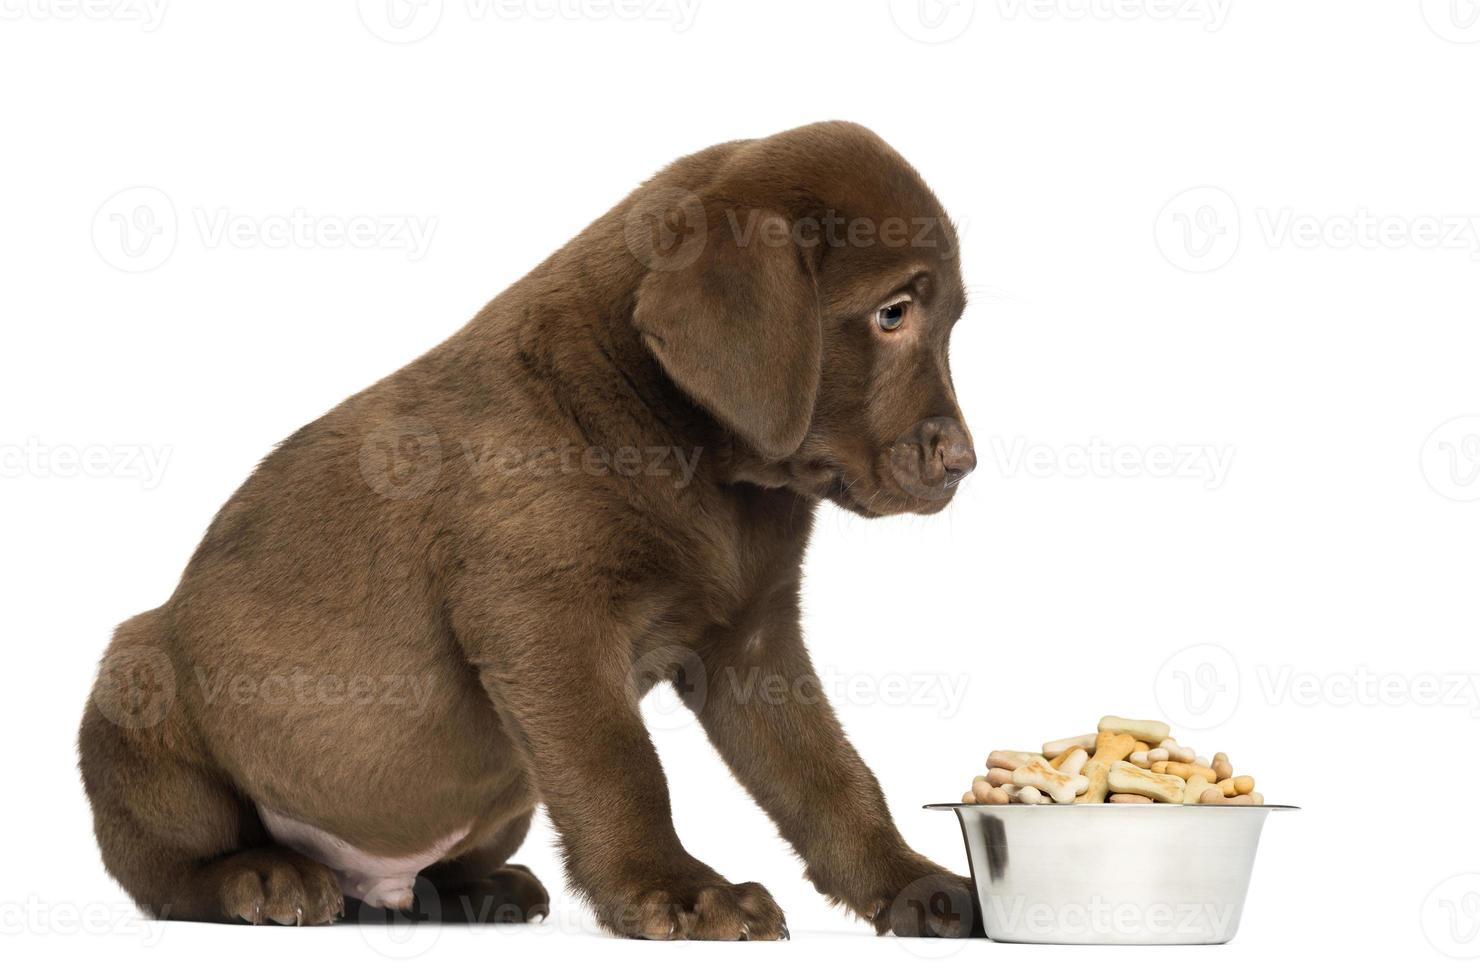 cachorro labrador retriever sentado con tazón de perro lleno, 2 meses foto